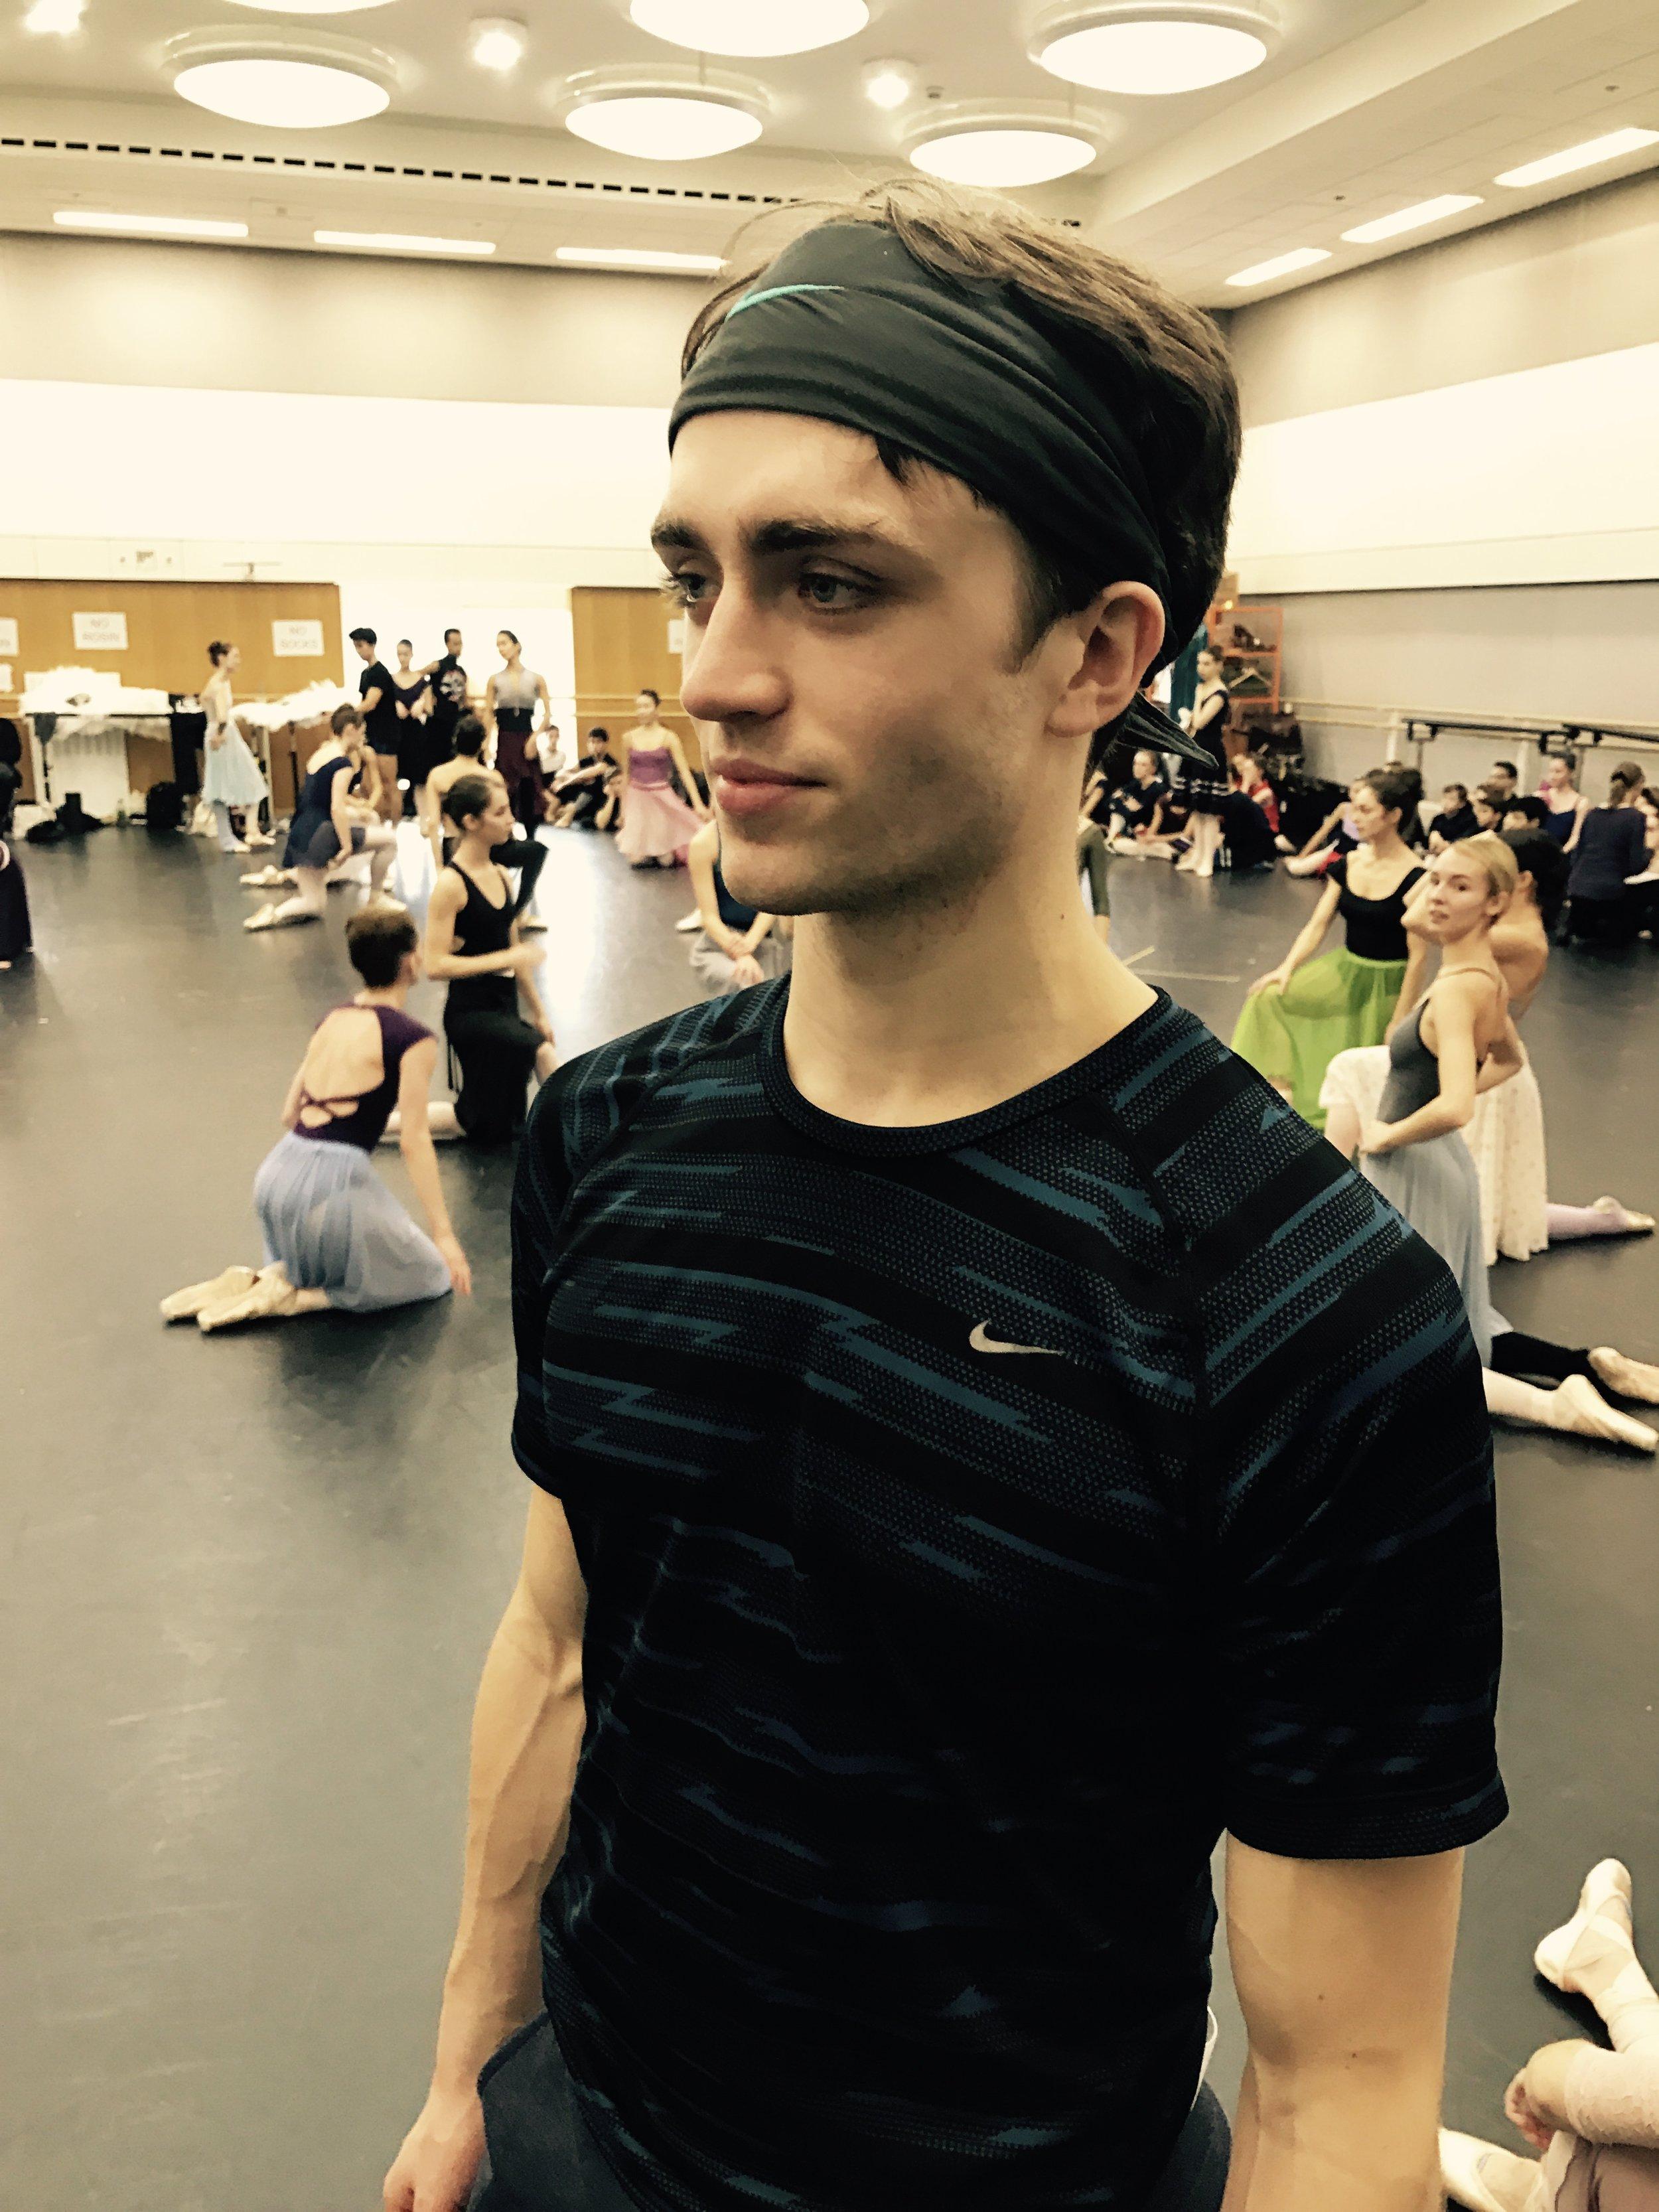 Matt- Using a bandana to keep his hair off his face